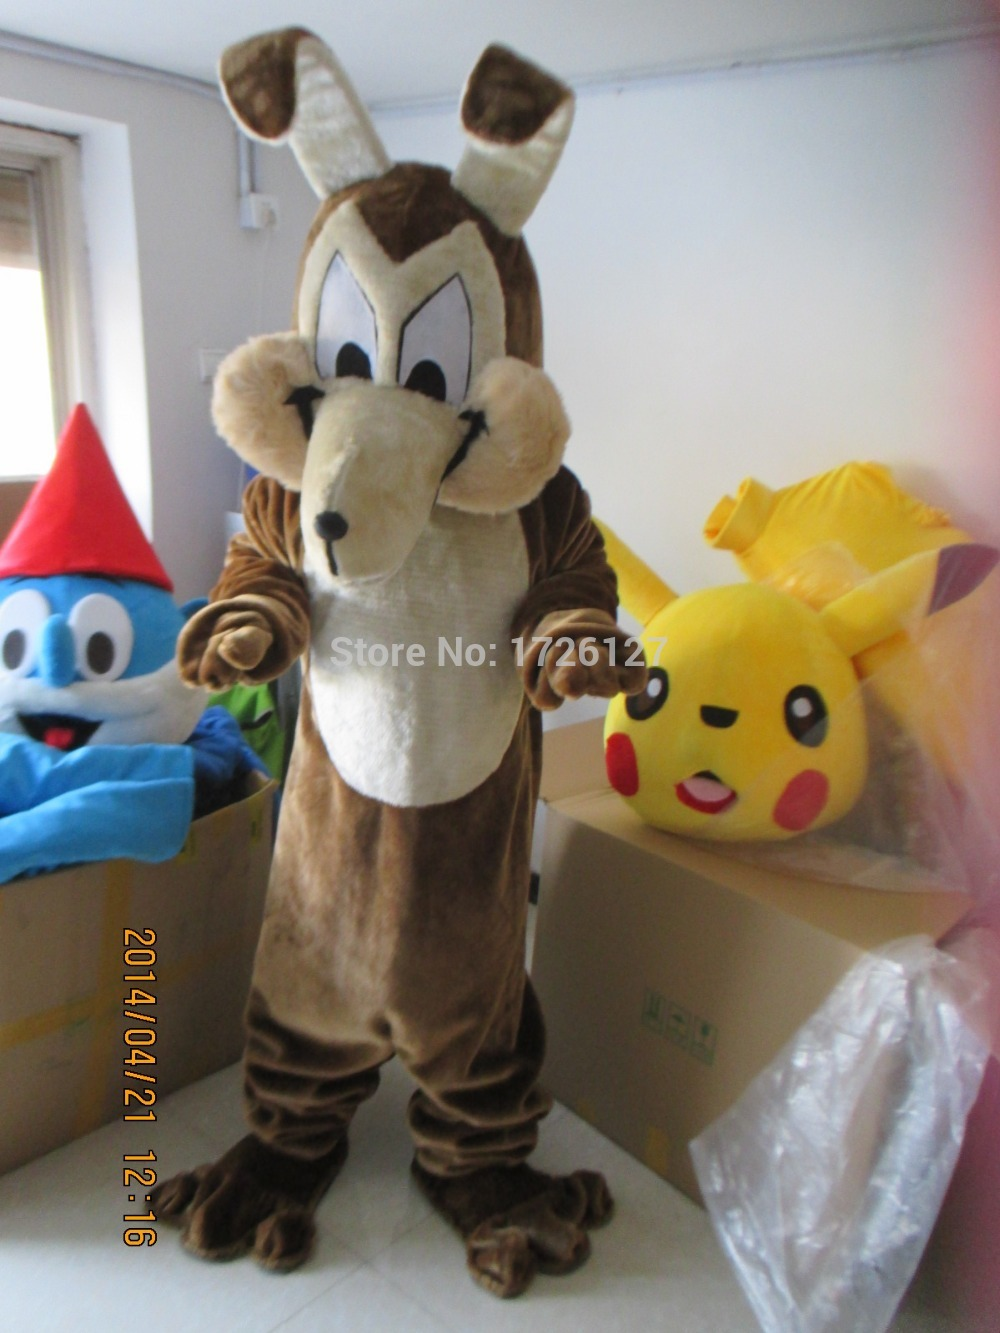 wolf mascot Coyote werewolf costume custom fancy costume anime cosplay character mascotte theme fancy dress carnival costume